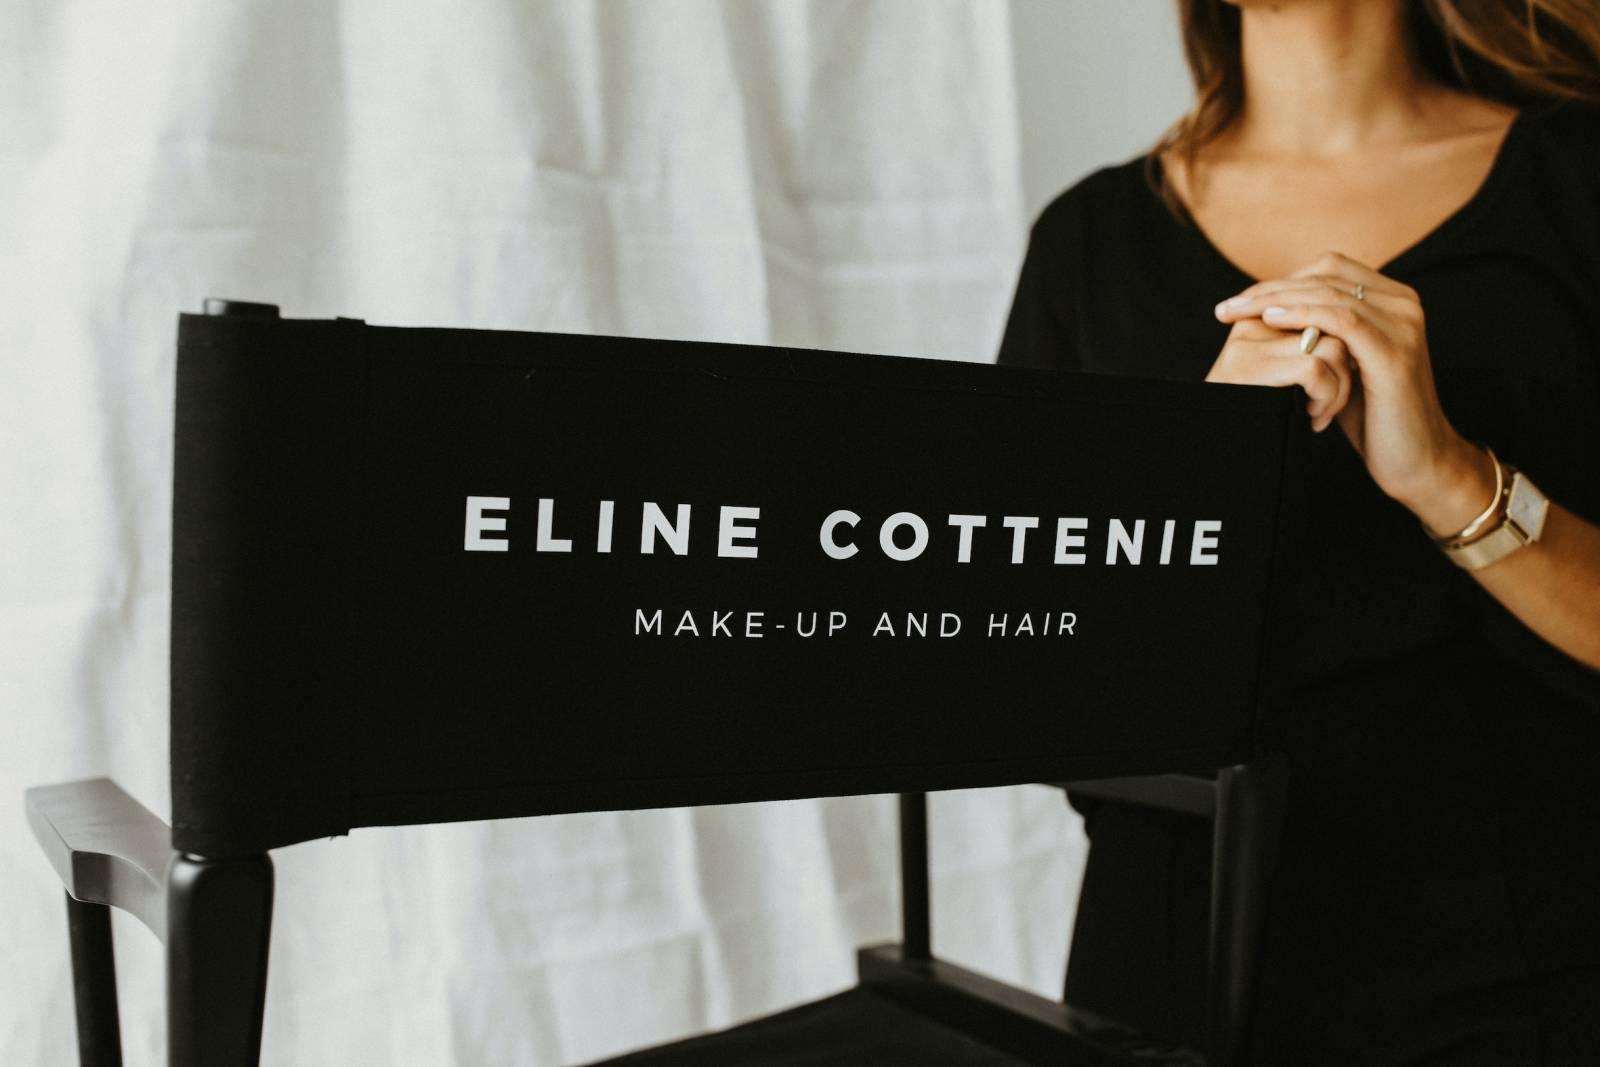 Eline Make-Up & Hair E Foto Delphine Otte - House of Weddings (1)